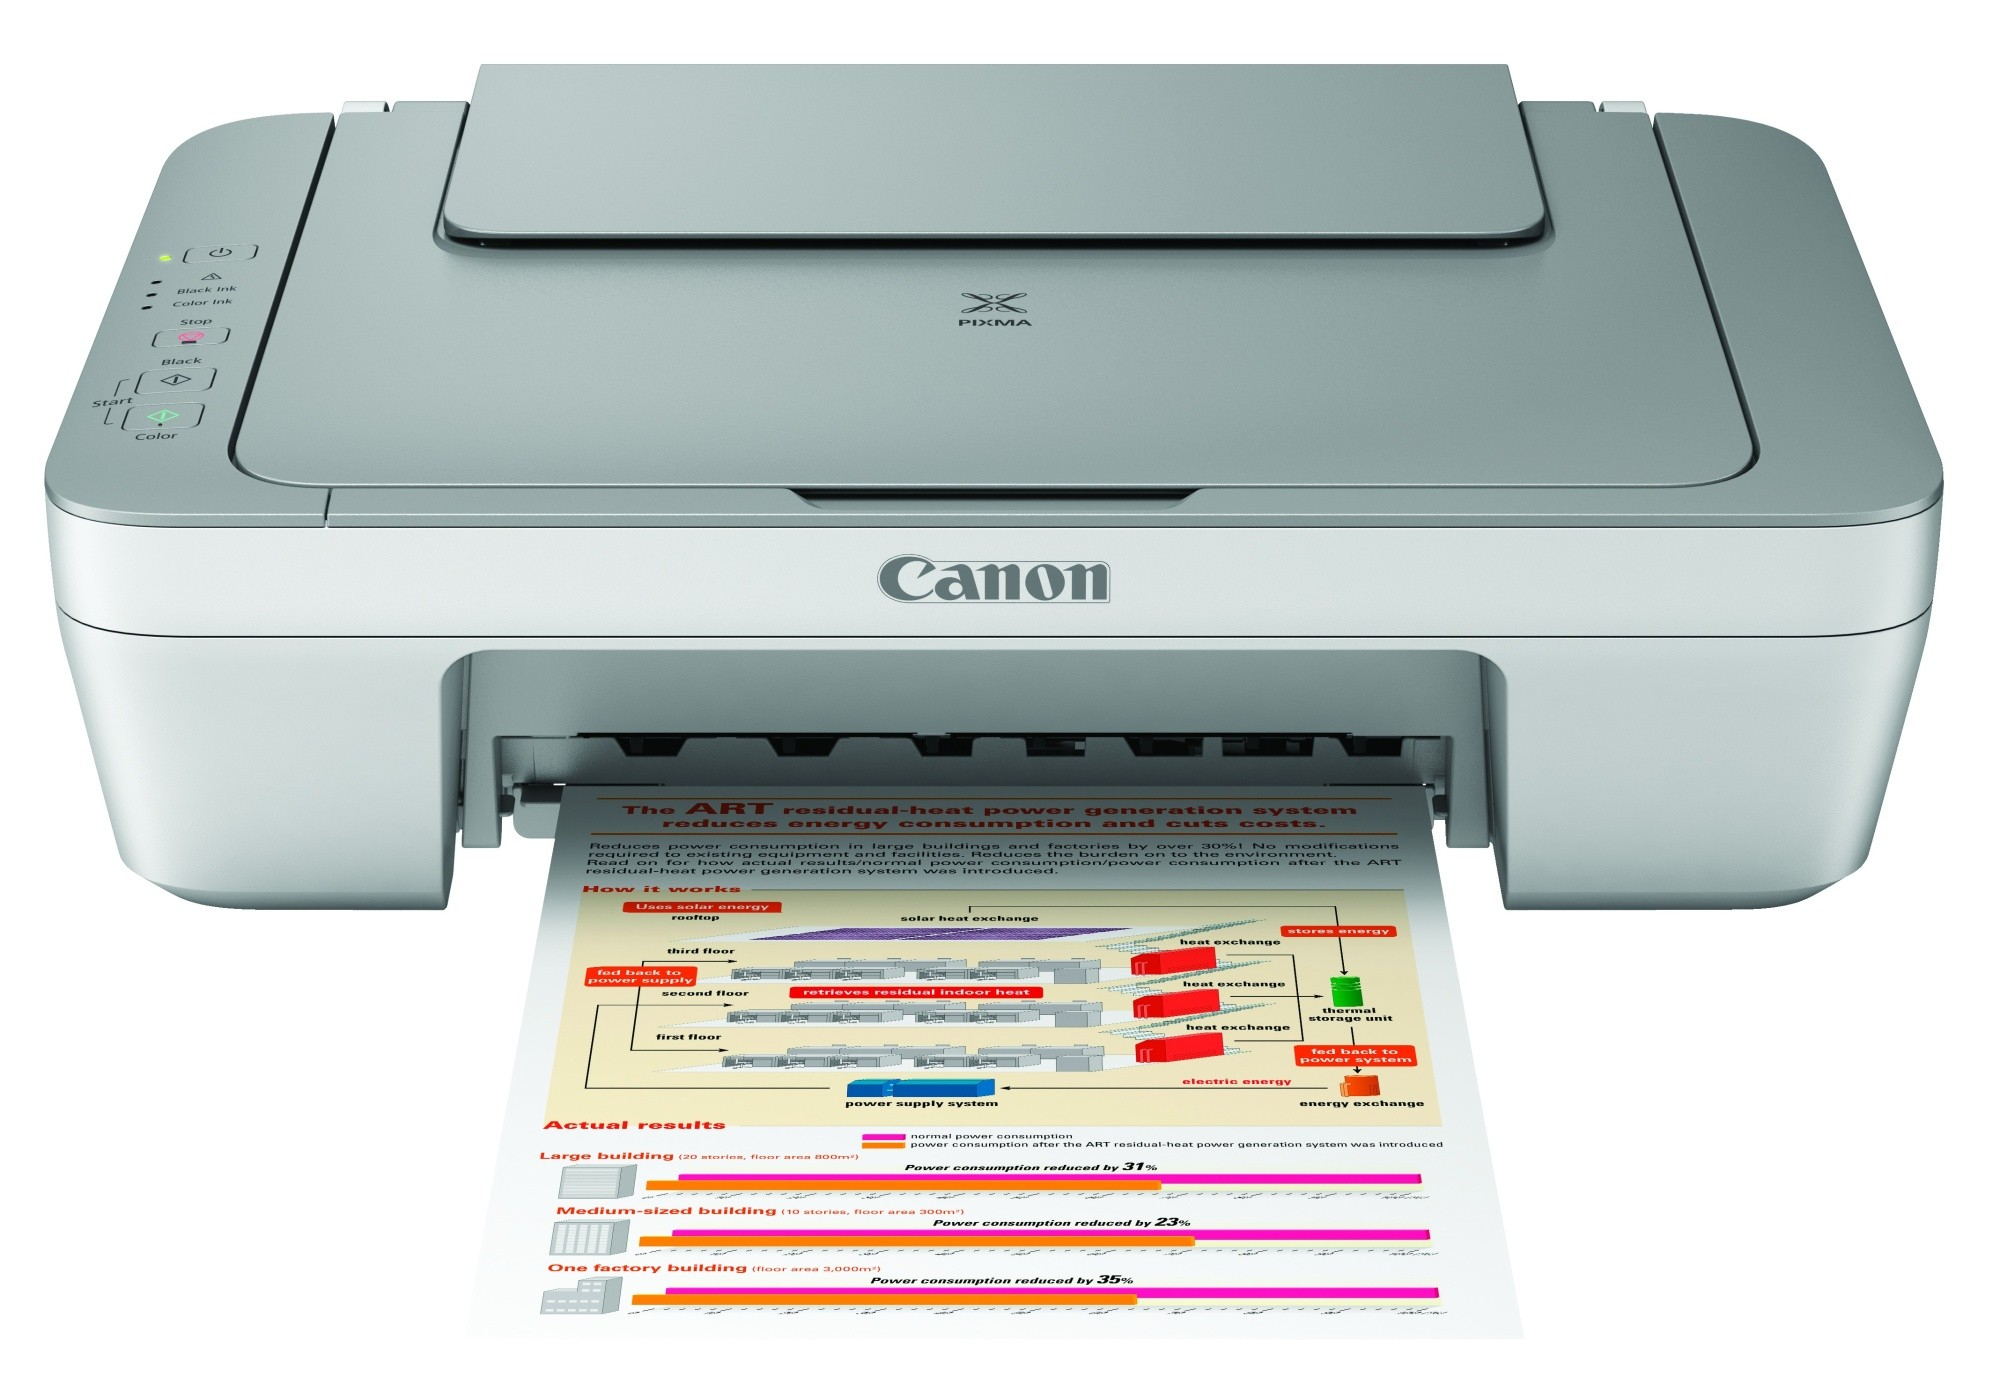 canon pixma mg2450 inkjet all in one high quality usb printer scanner copier ebay. Black Bedroom Furniture Sets. Home Design Ideas